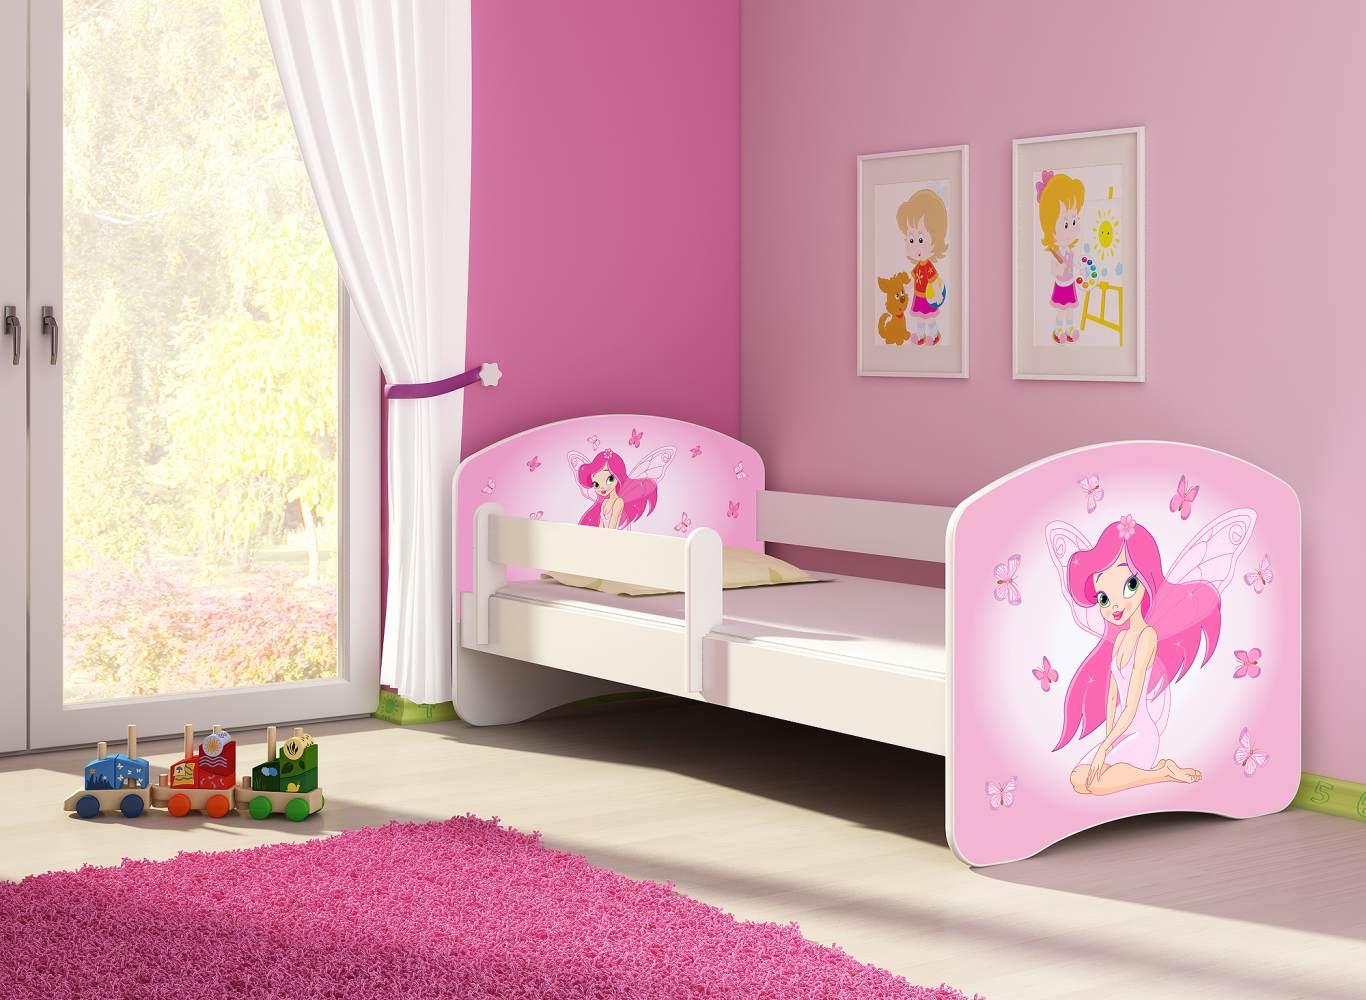 Clamaro 'Fantasia' Kinderbett 'Pink Fairy' 80 x 160 cm inkl. Rausfallschutz, Matratze und Lattenrost Bild 1